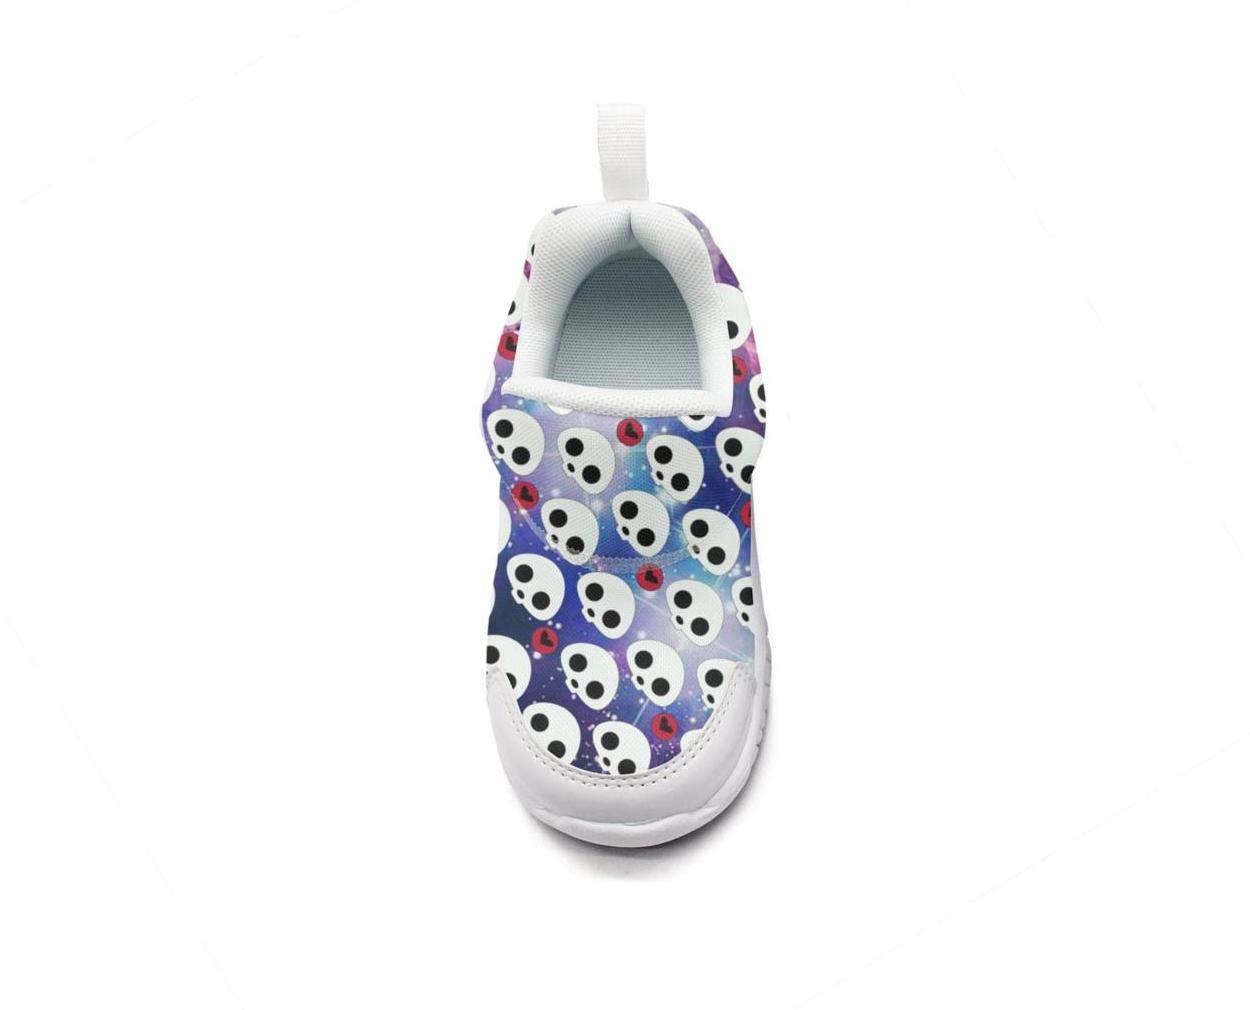 ONEYUAN Children Vintage Skull Crossbones Art Balck Kid Casual Lightweight Sport Shoes Sneakers Running Shoes